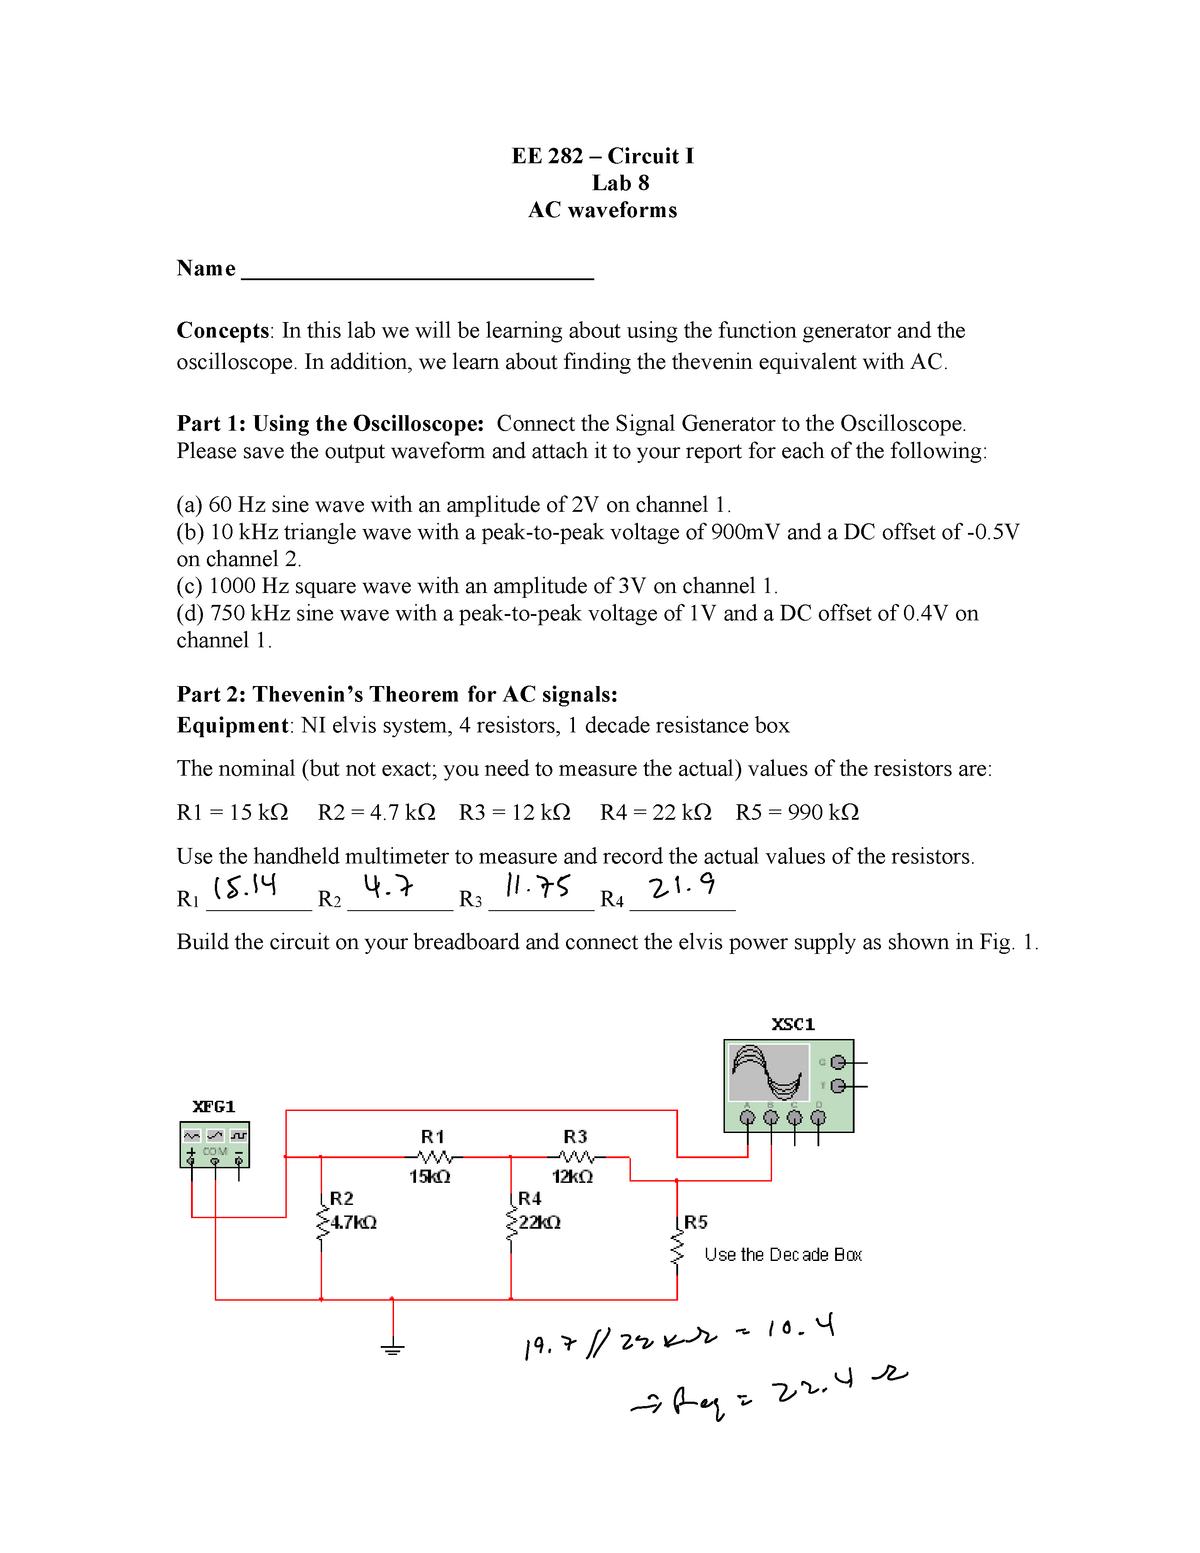 EE 282 Lab 8 - Lab 8 - ECE 282L: Circuits I Lab - StuDocu